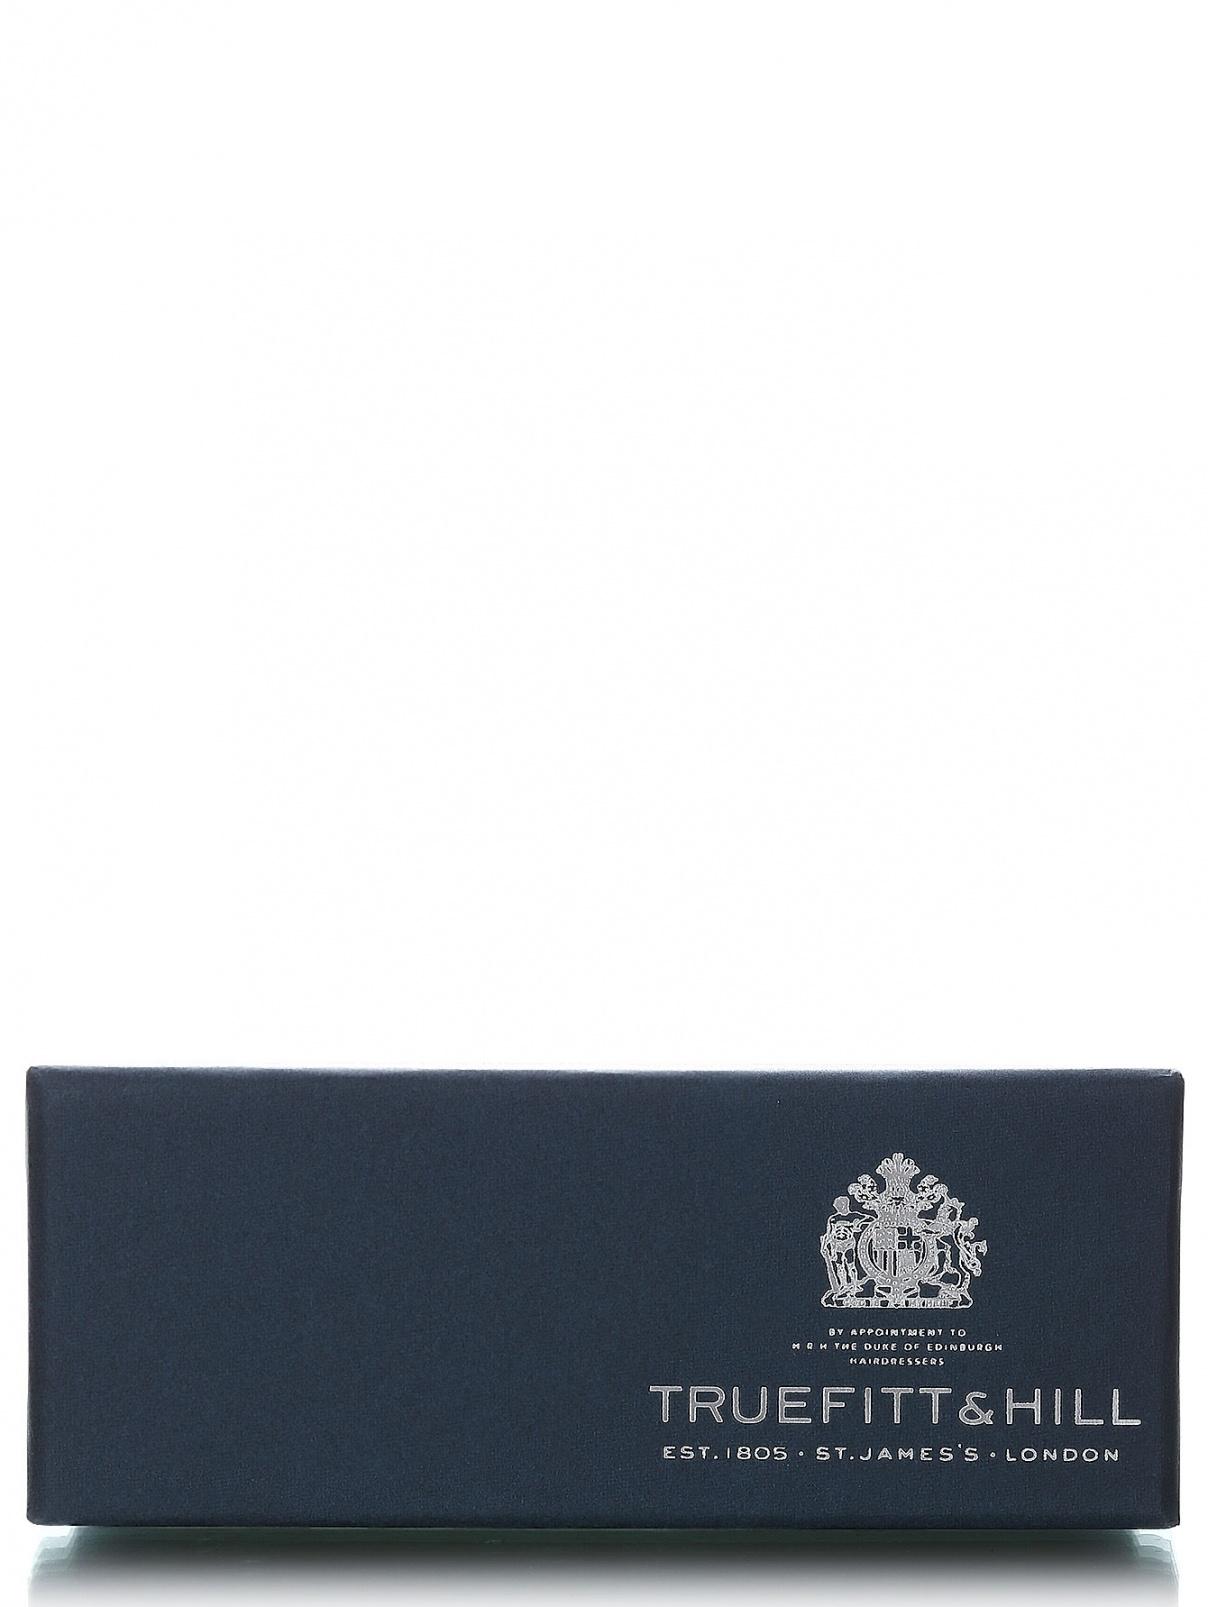 Кисть для бритья - Est 1805 Truefitt & Hill  –  Модель Общий вид